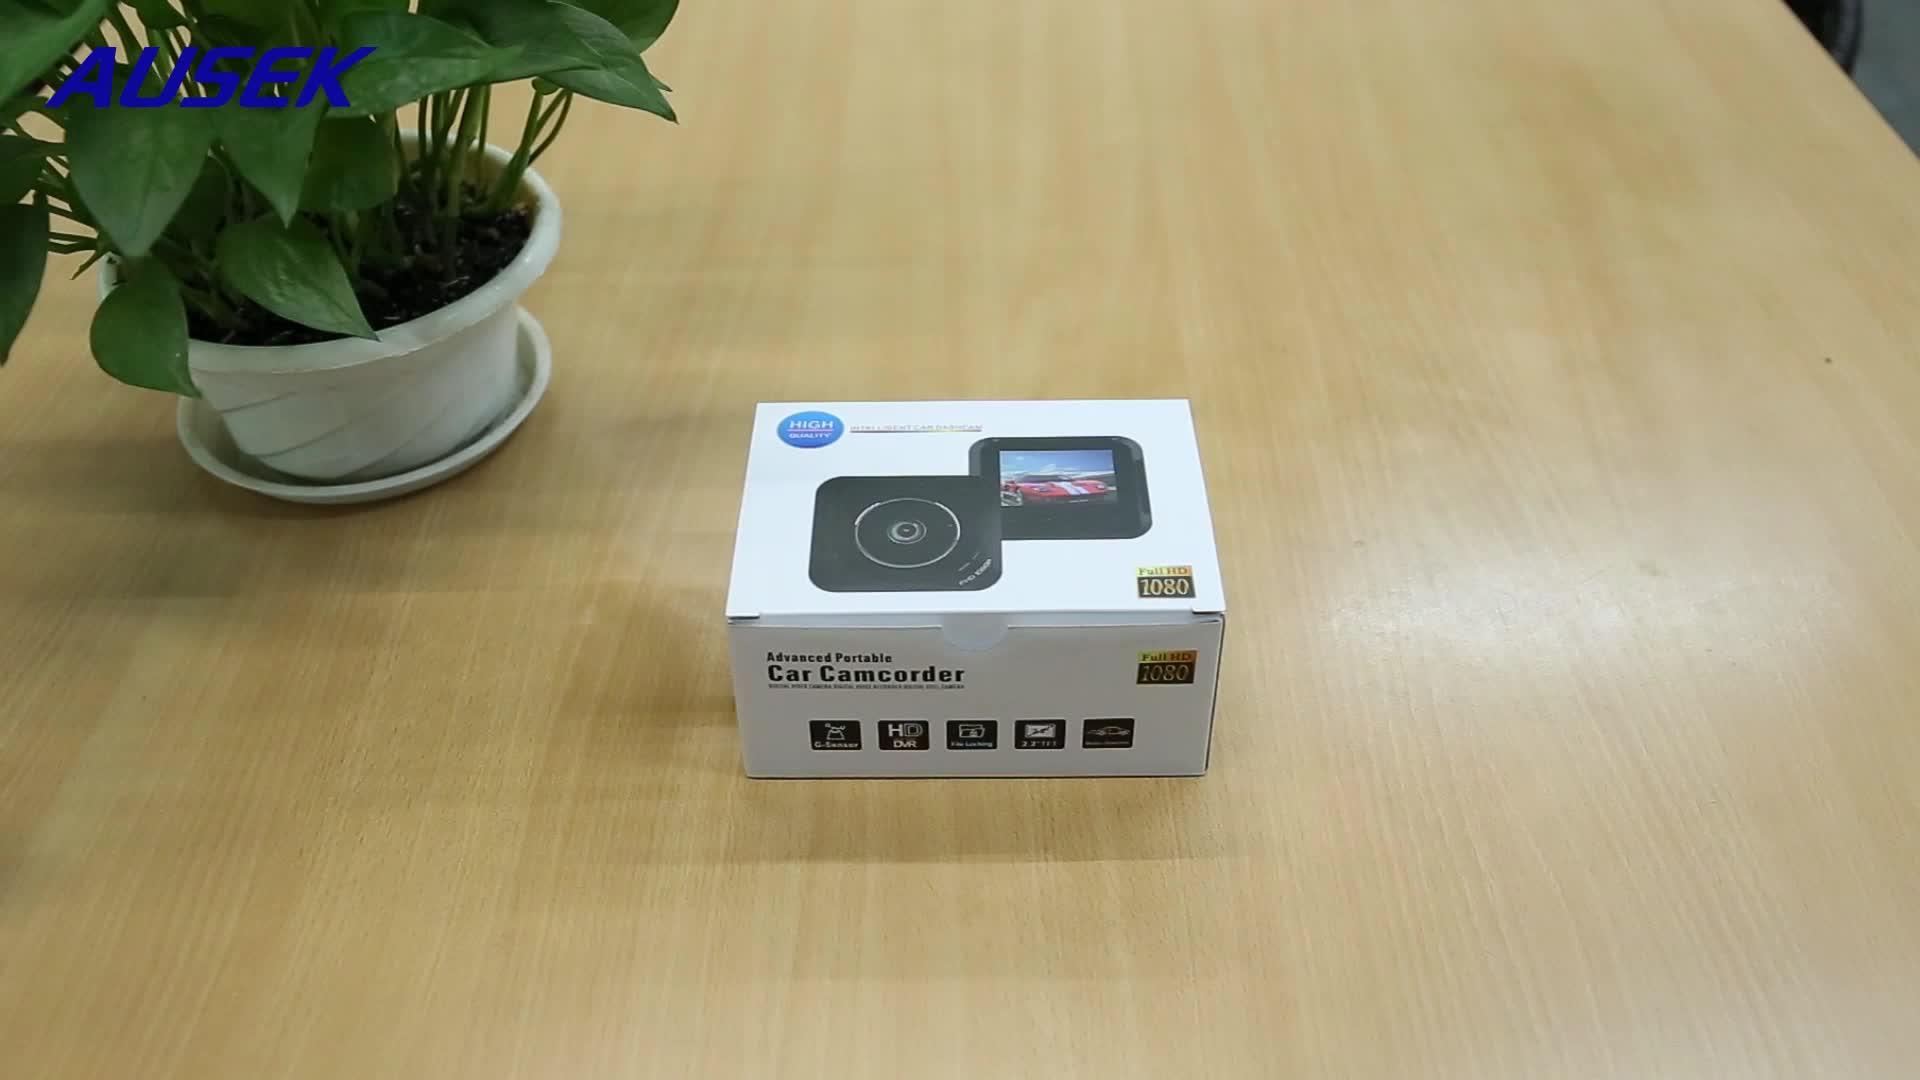 Ape Mobil Kamera Perekam dengan Super Malam Visi 170 Derajat Sudut Lebar 1080P Full HD Kamera Dasbor